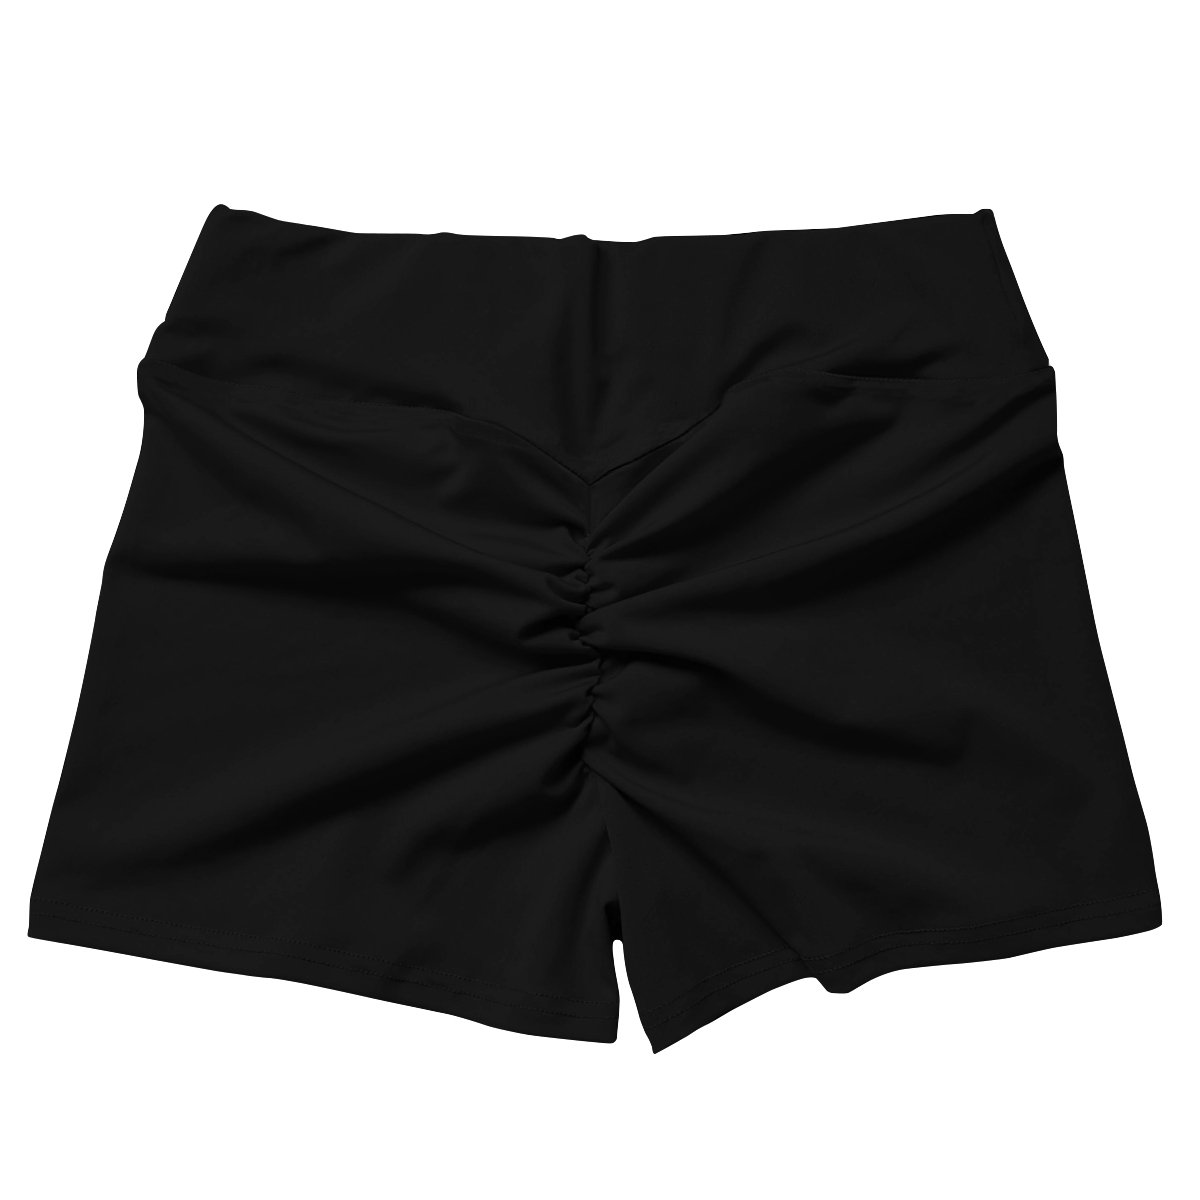 re zero subaru natsuki active wear set 952506 - Anime Swimsuits